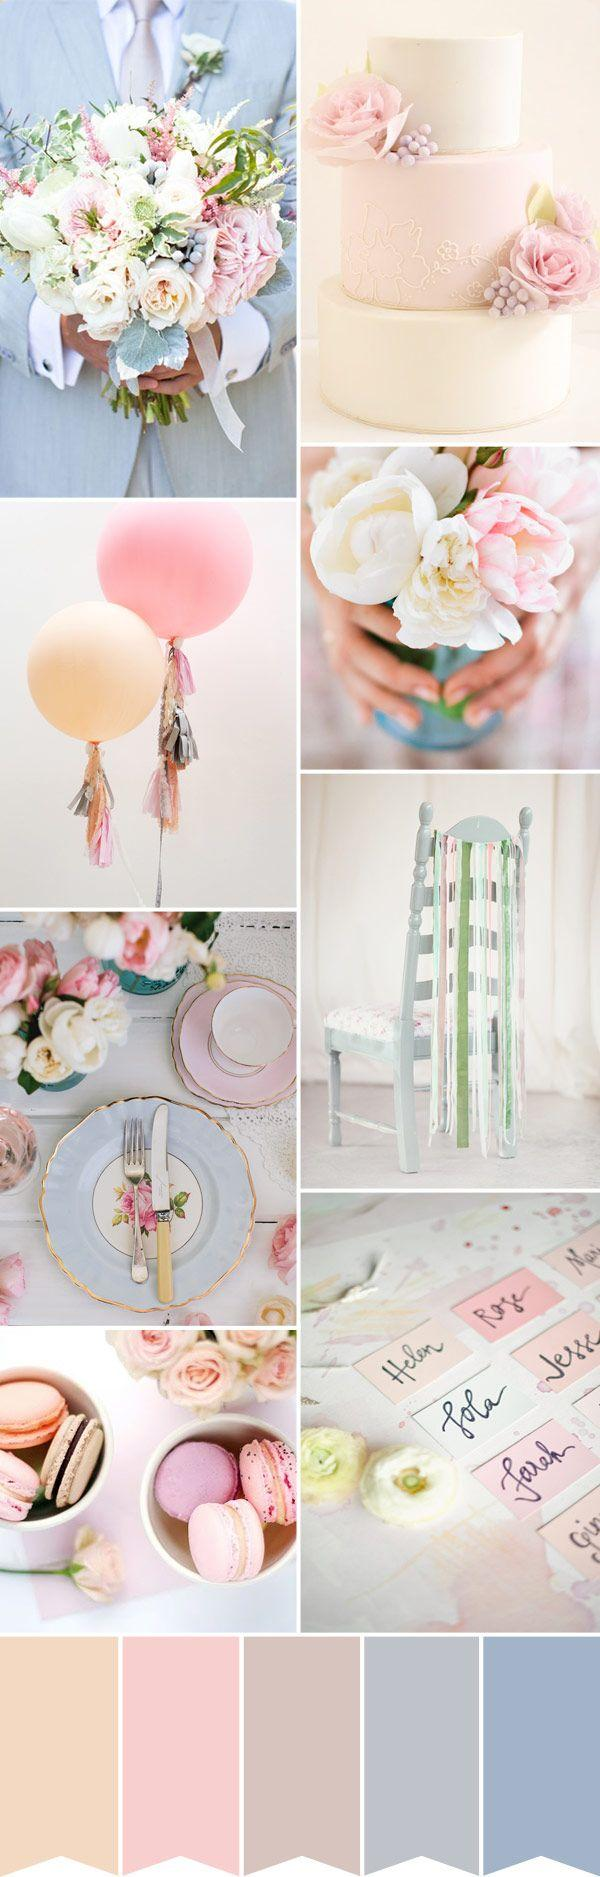 Wedding - Pastel Wedding Style